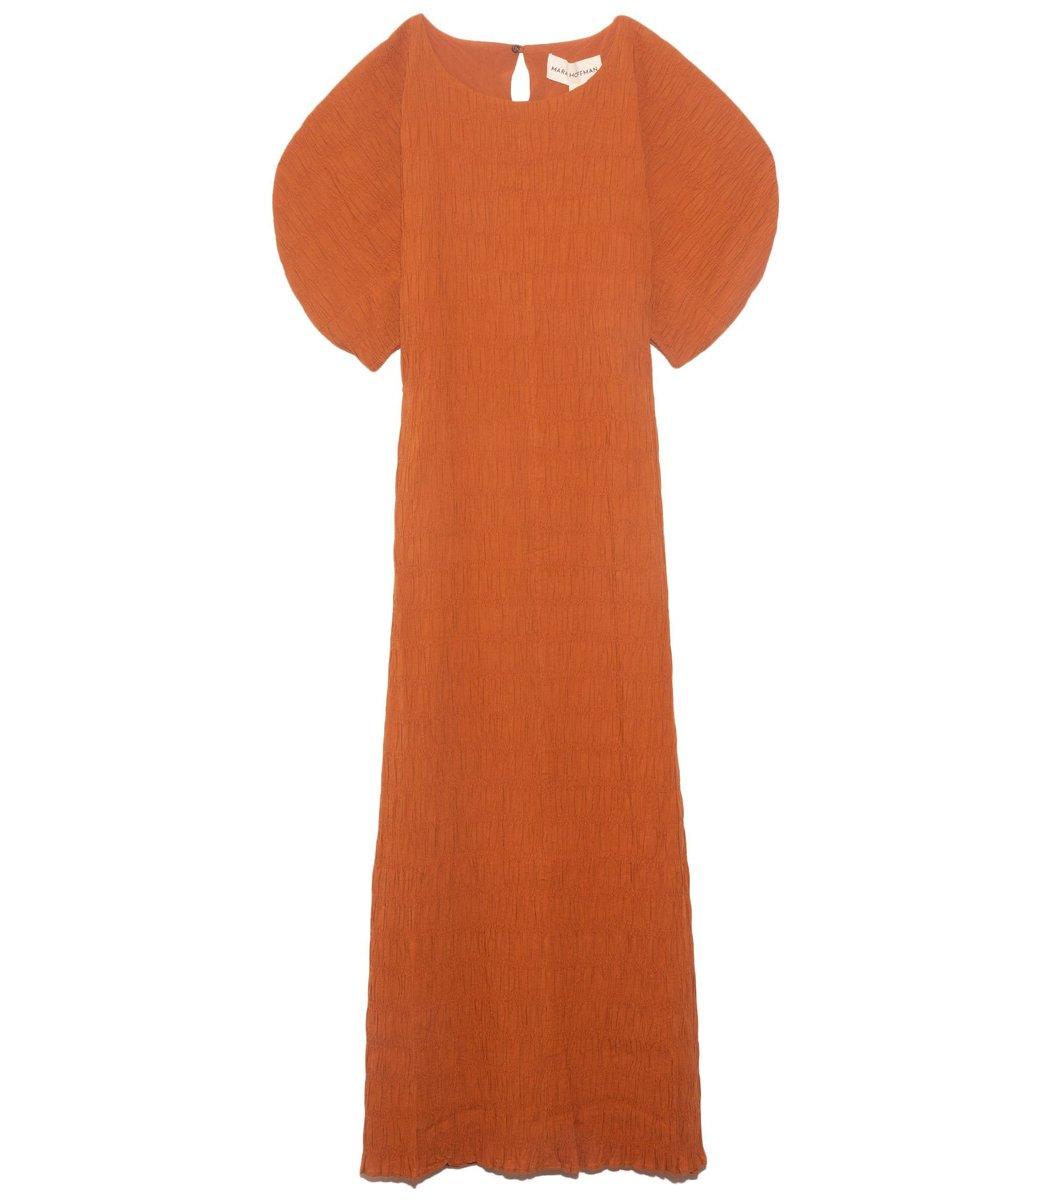 Mara Hoffman Aranza Dress in Rust